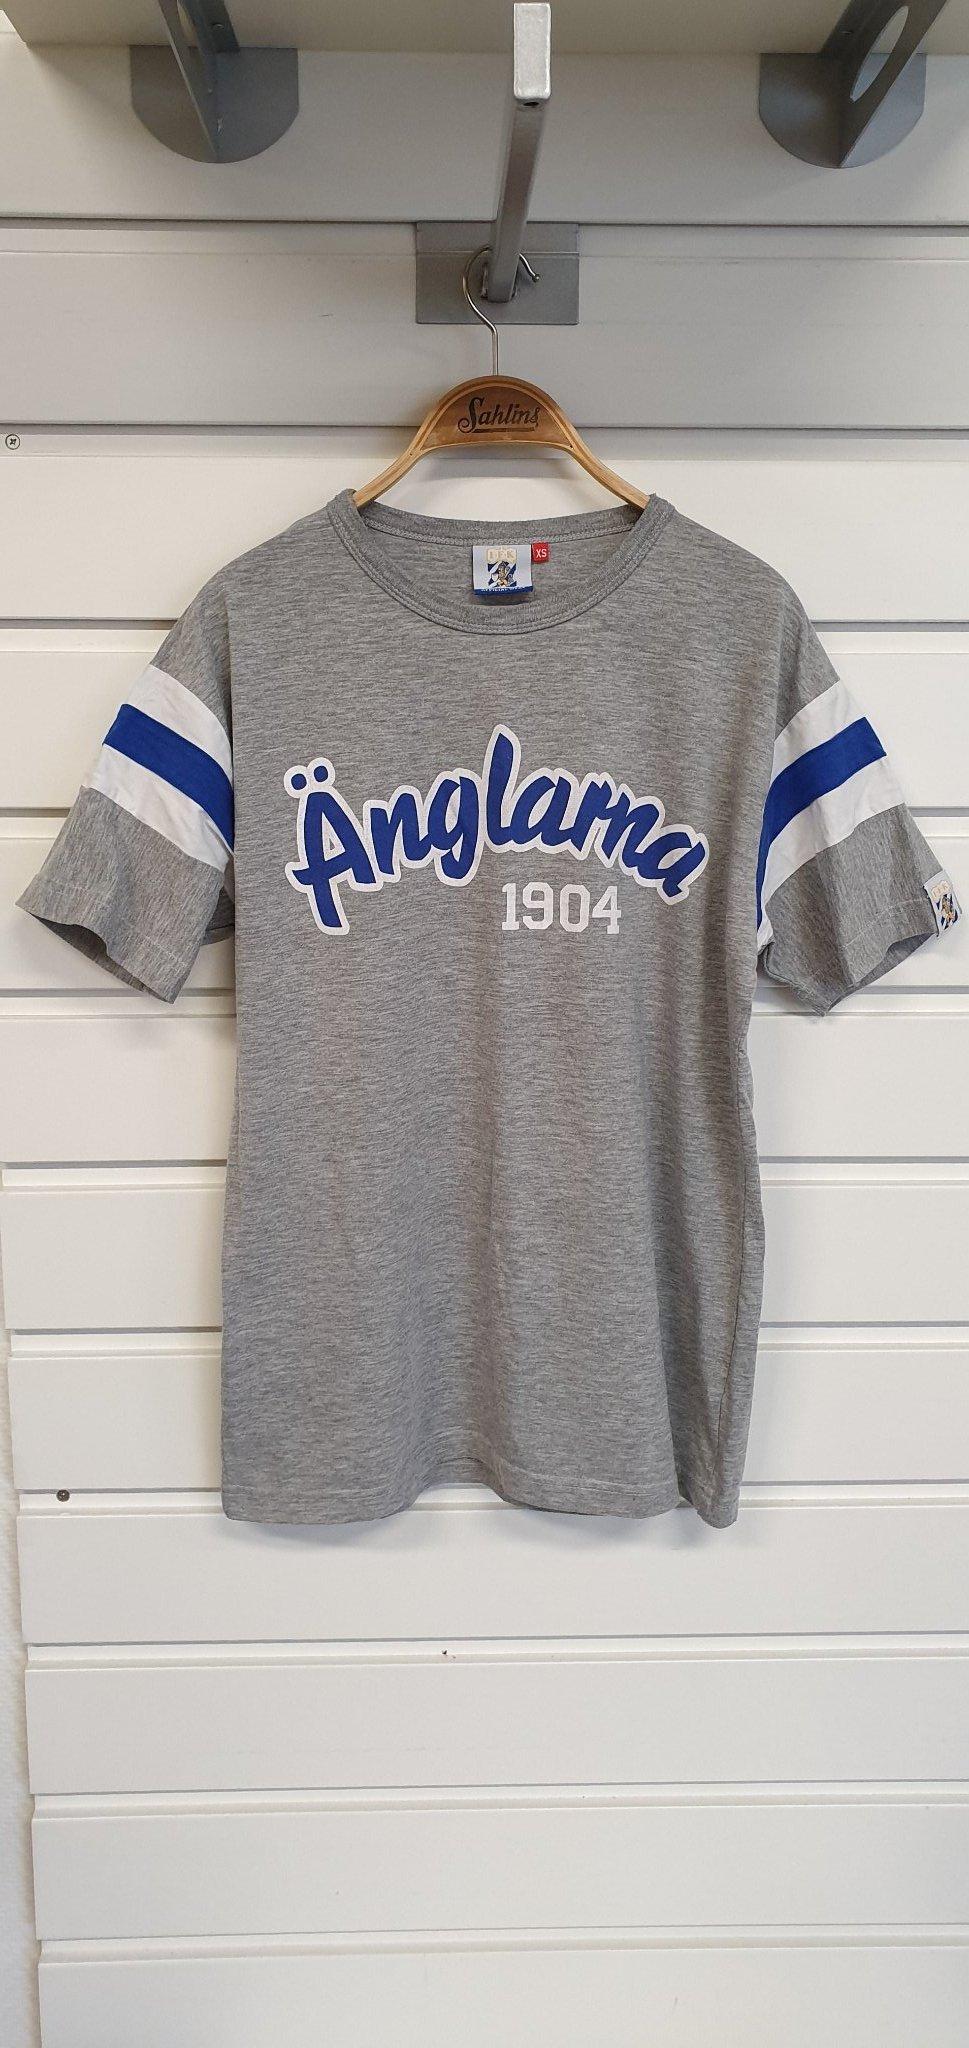 bc6af65ca3a3 IFK Göteborg t-shirt tröja blåvitt i stl XS (353004931) ᐈ Köp på ...